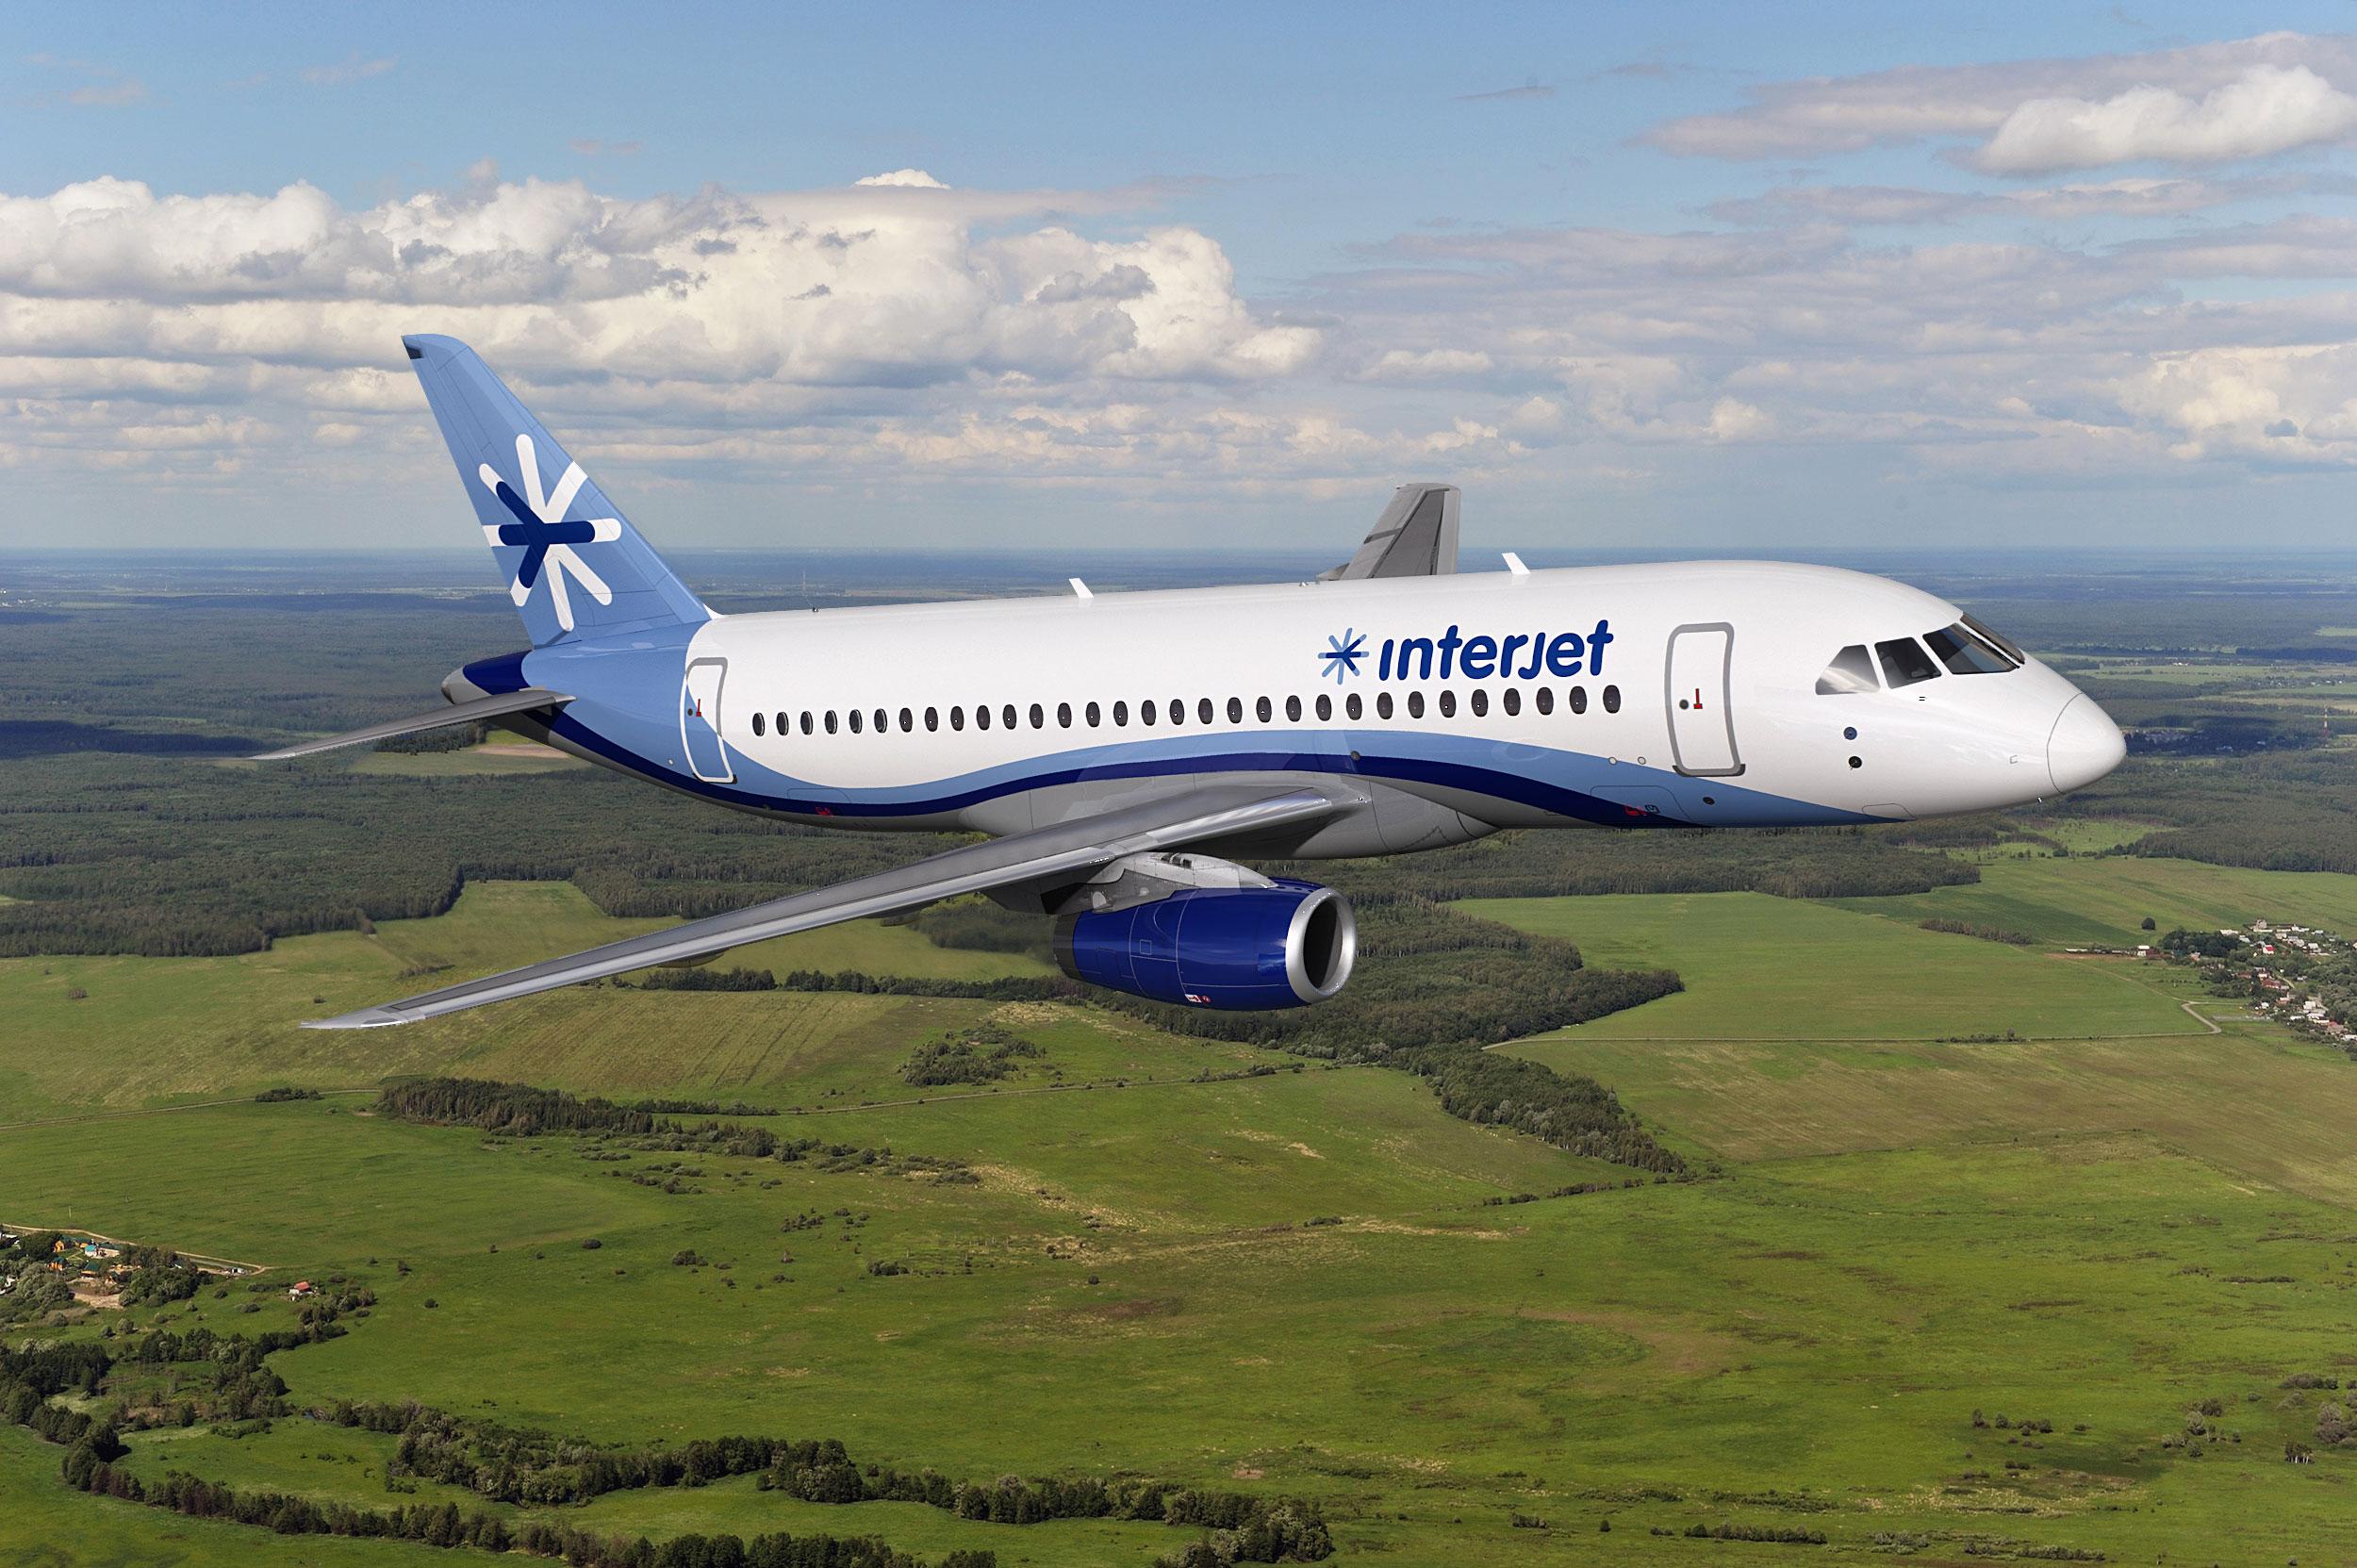 Revista Latitud 21 » Interjet vuela alto con Superjet 100